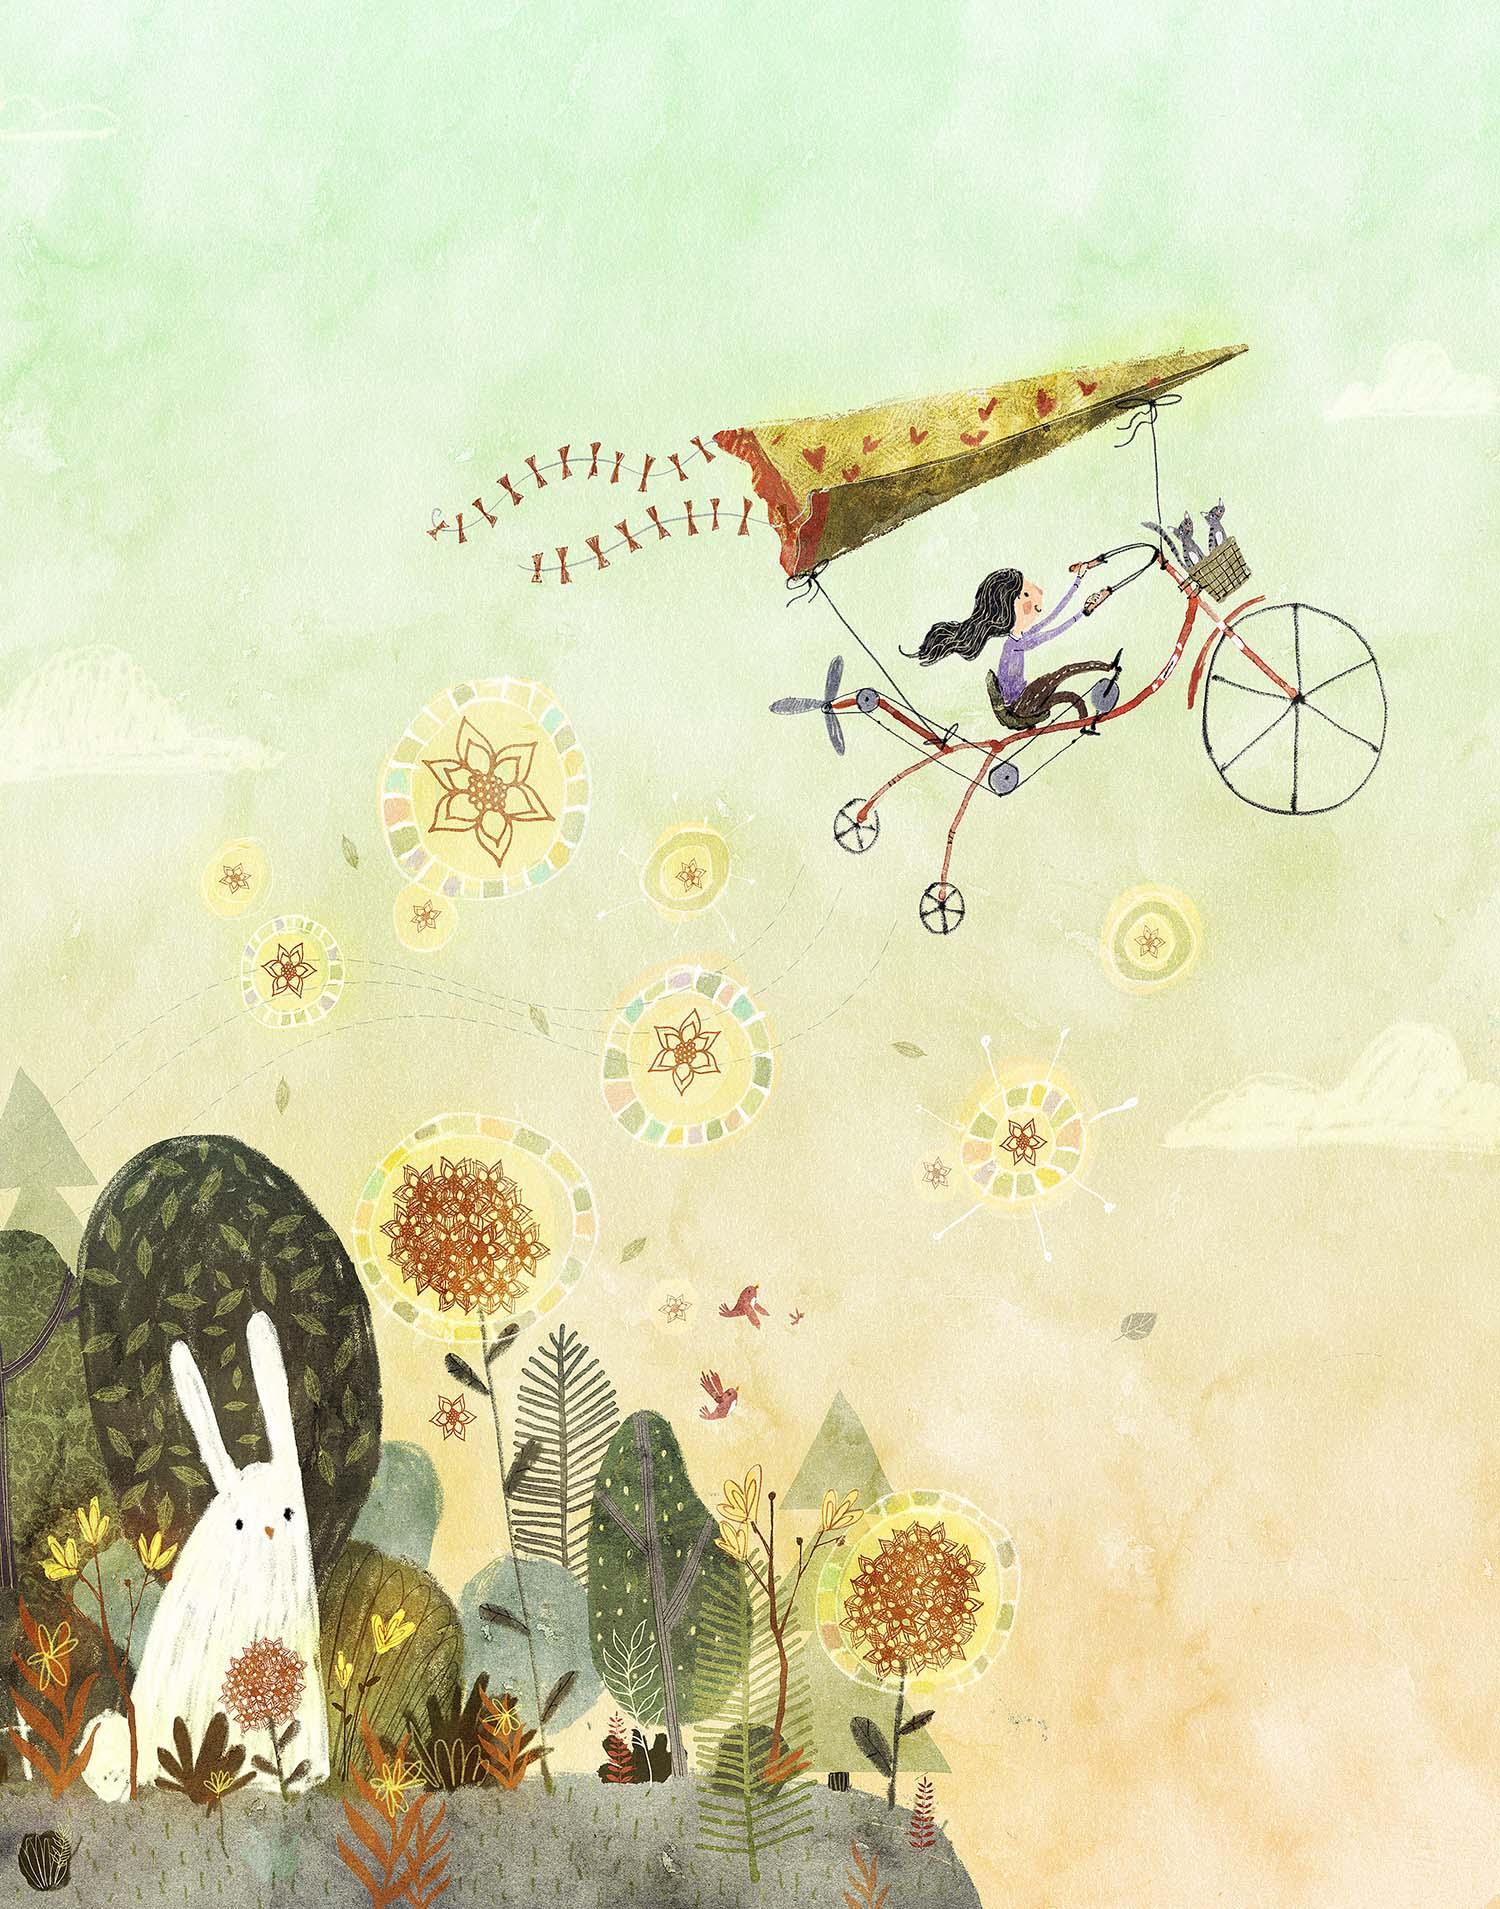 flying-colors-illustration-by-Lee-White-1500.jpg